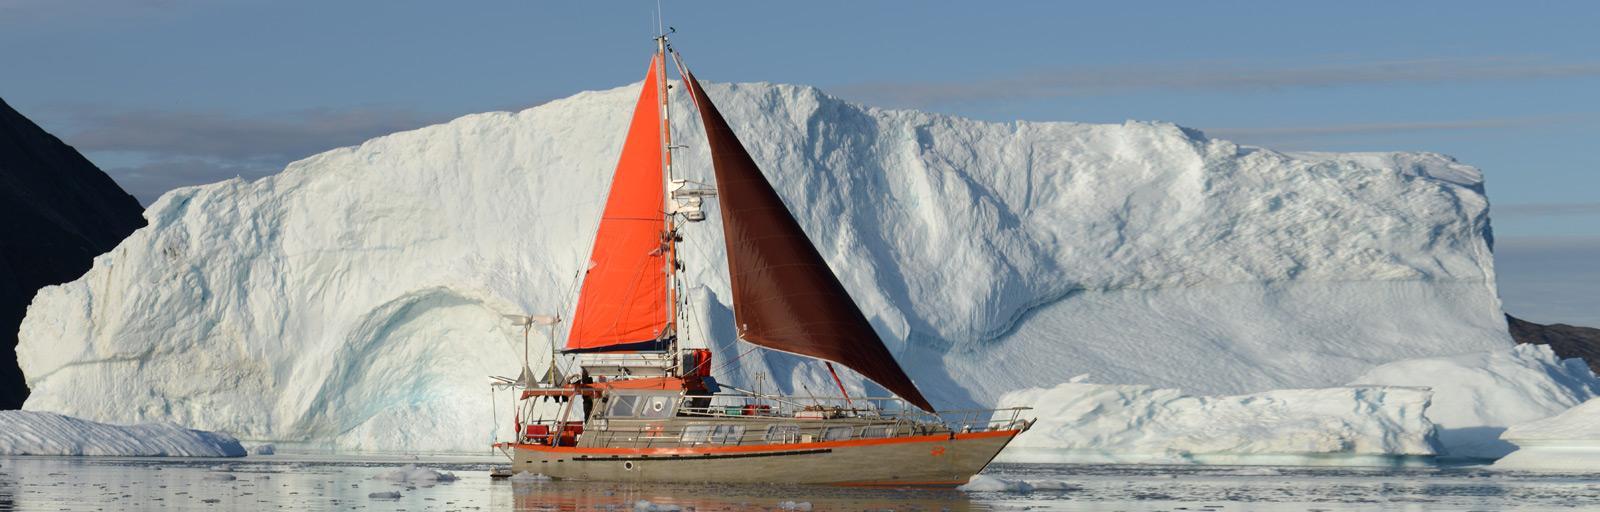 META 47 POLAR Motorsailer - Groenland